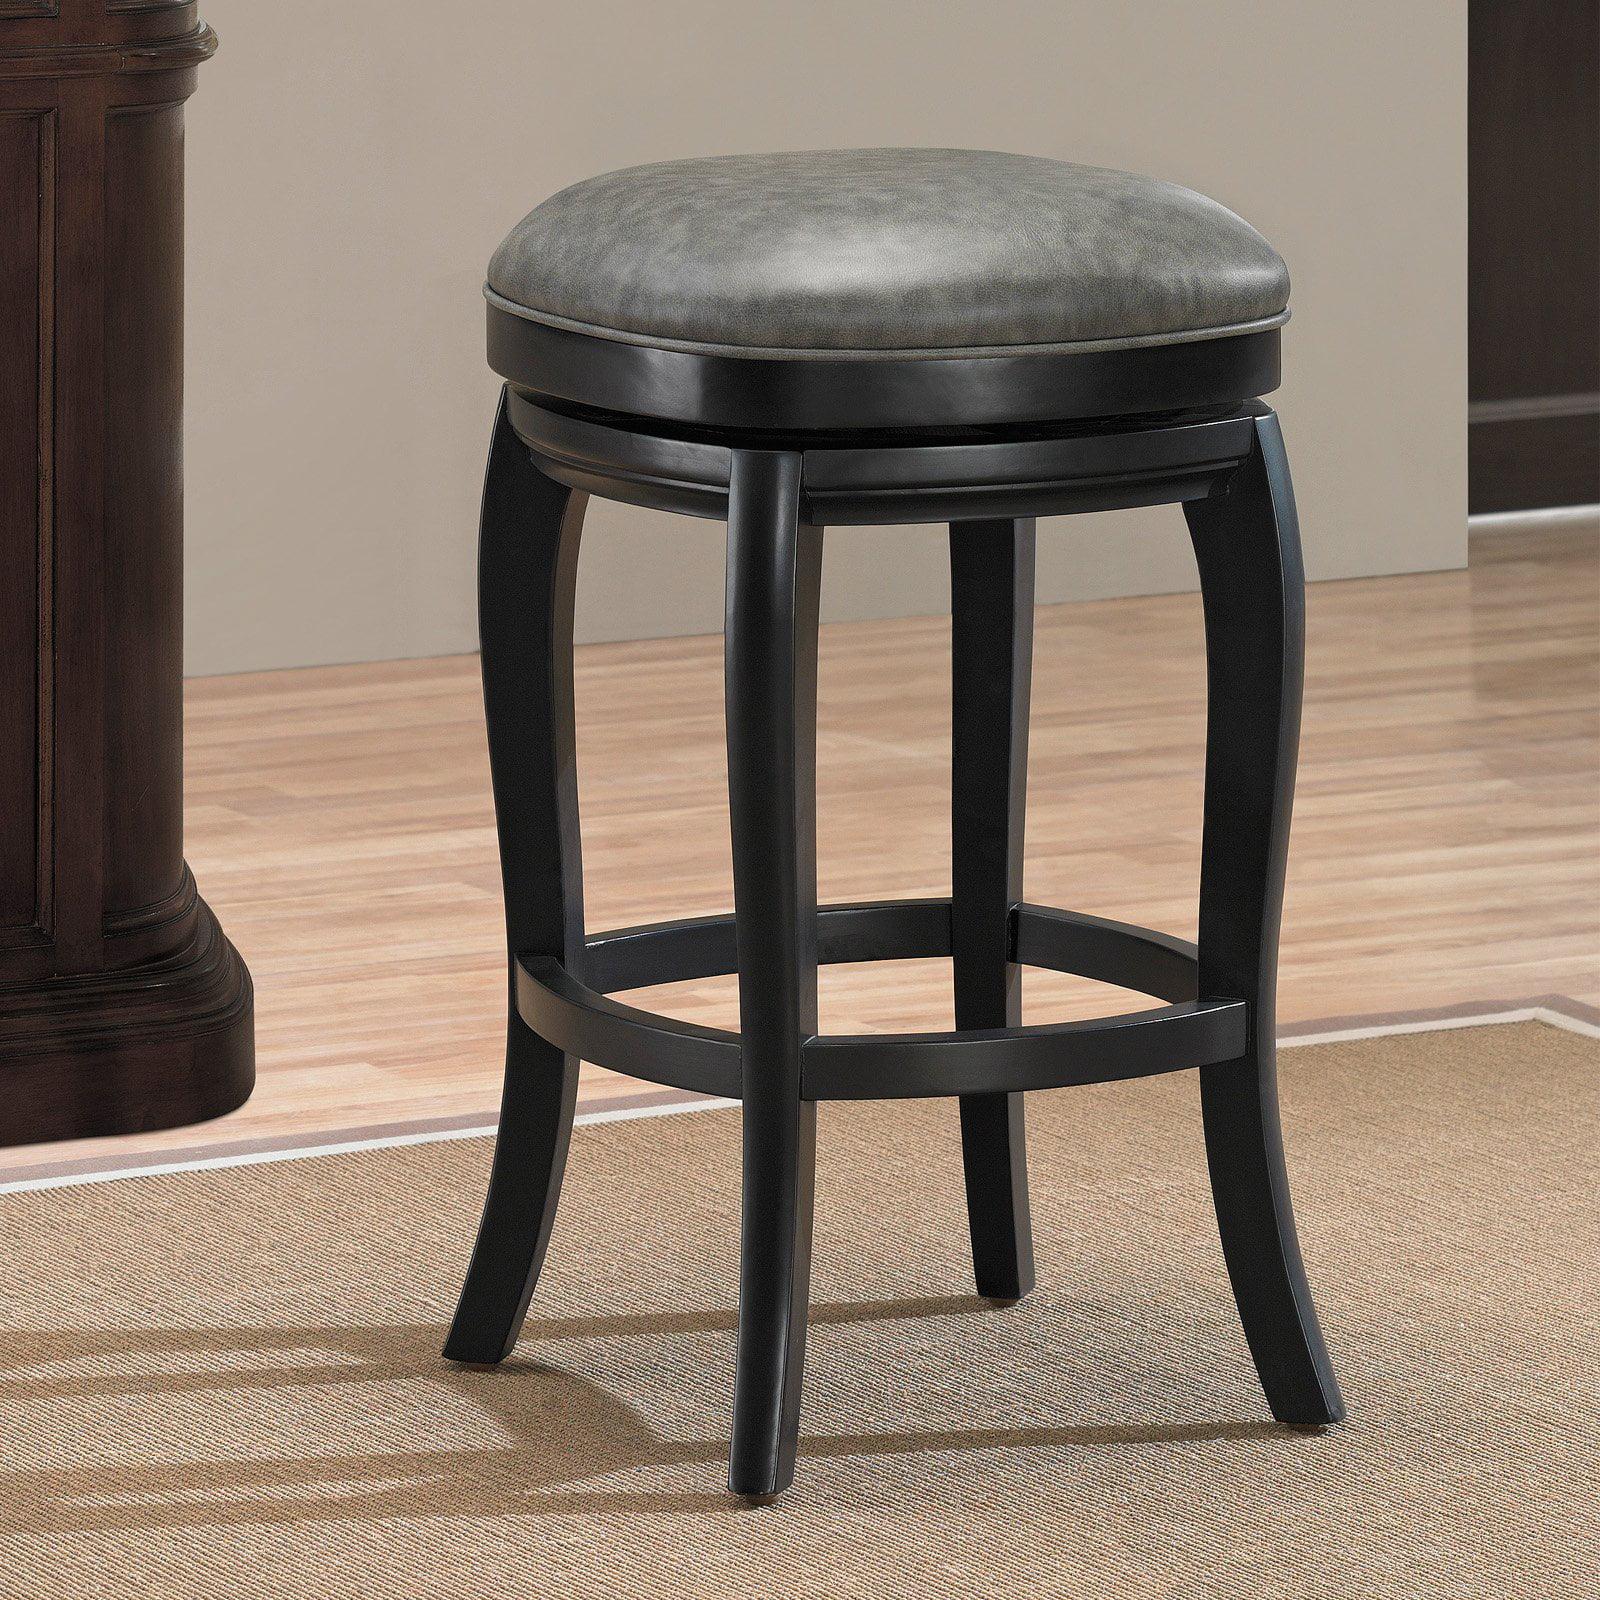 Ahb madrid backless counter height stool walmart com